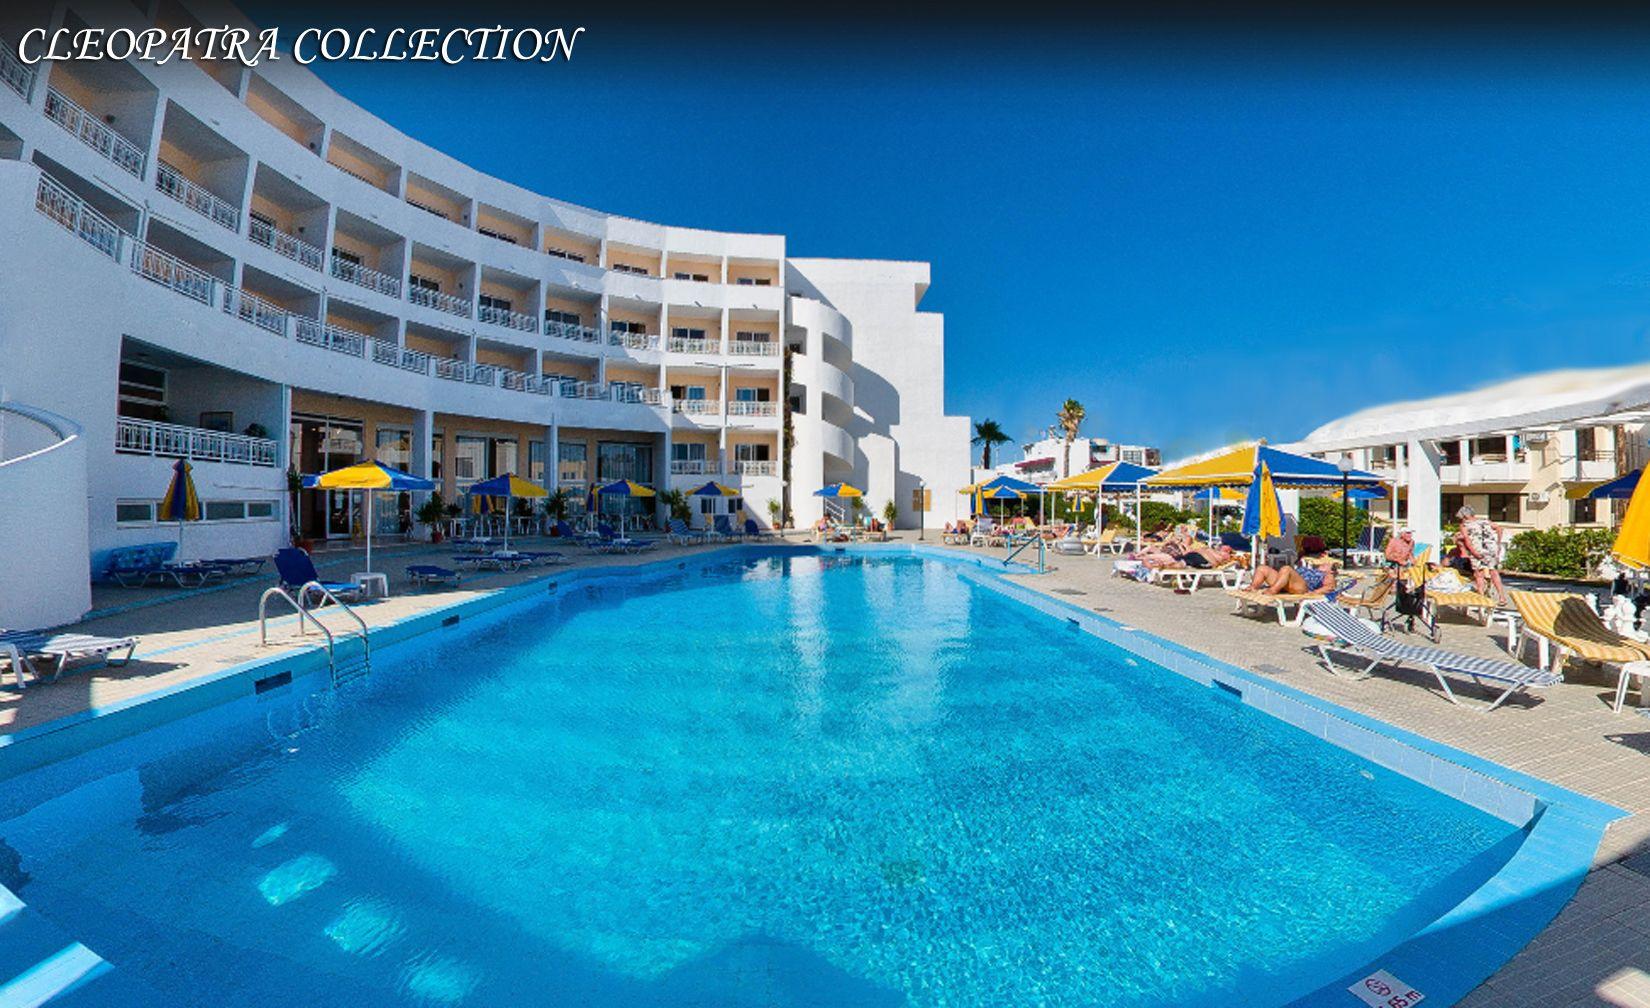 Cleopatra Kris Mari Hotel - Καρδάμαινα, Κως ✦ 2 Ημέρες (1 Διανυκτέρευση) ✦ 2 άτομα ✦ Πρωινό ✦ 01/07/2021 έως 31/08/2021 ✦ Κοντά σε Παραλία!